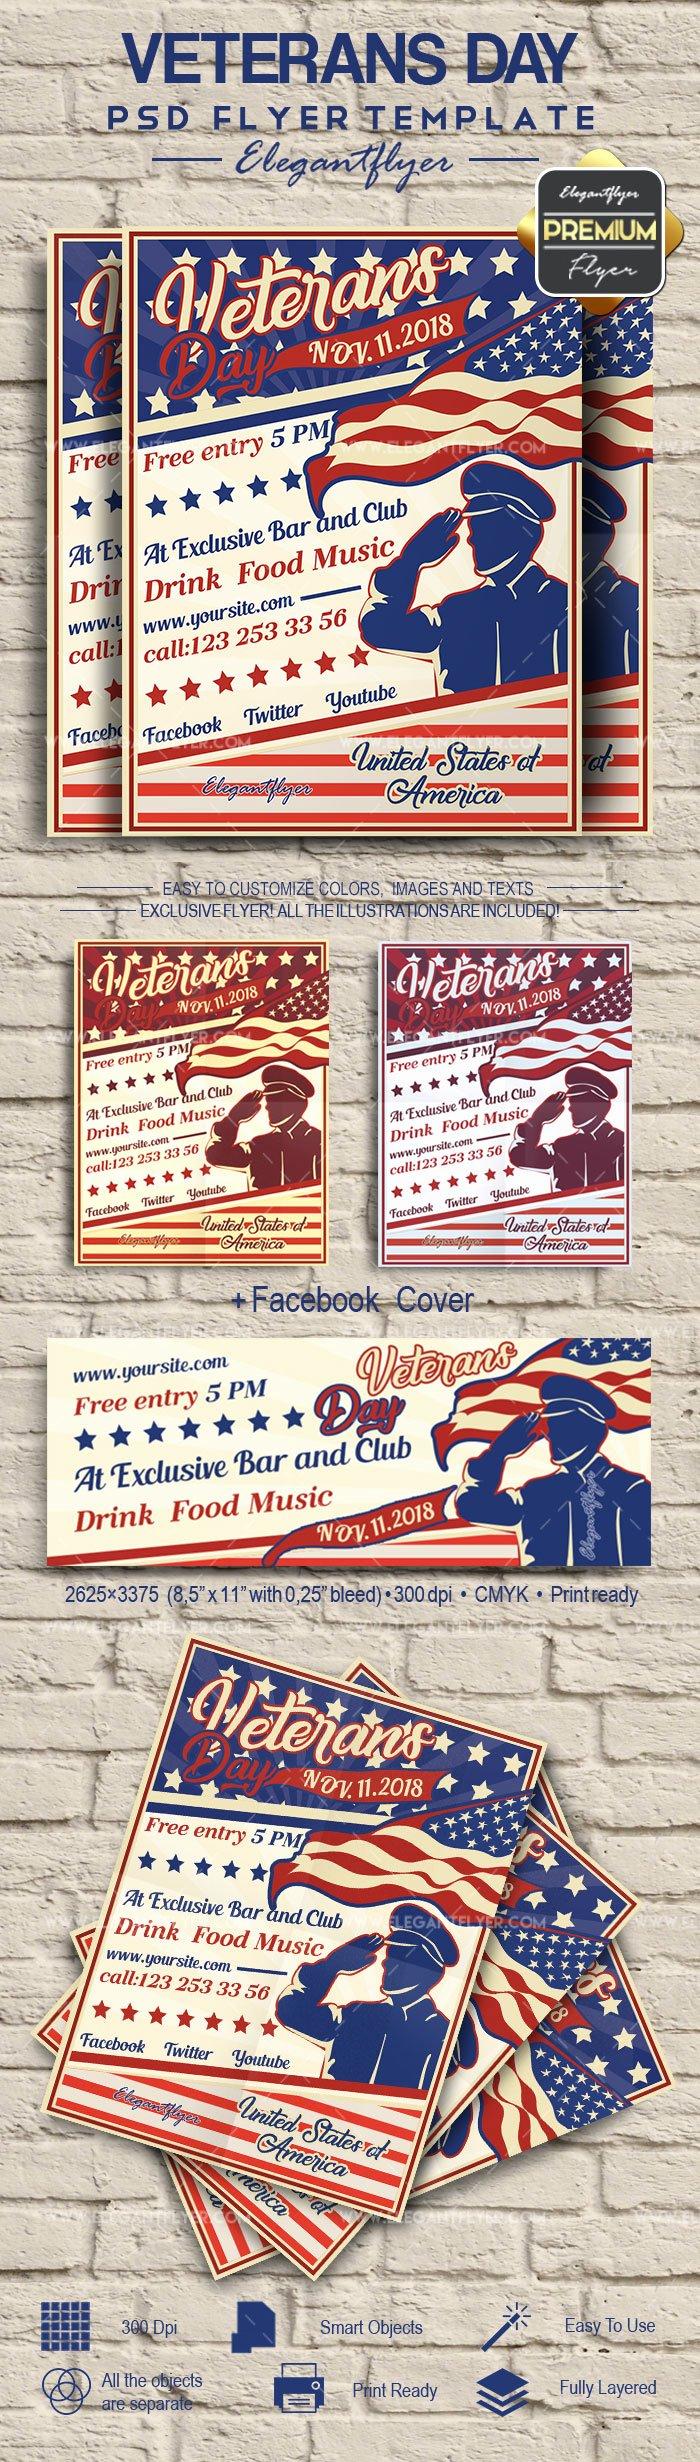 Veterans Day Flyer Templates Free Luxury Veterans Day Psd Poster – by Elegantflyer